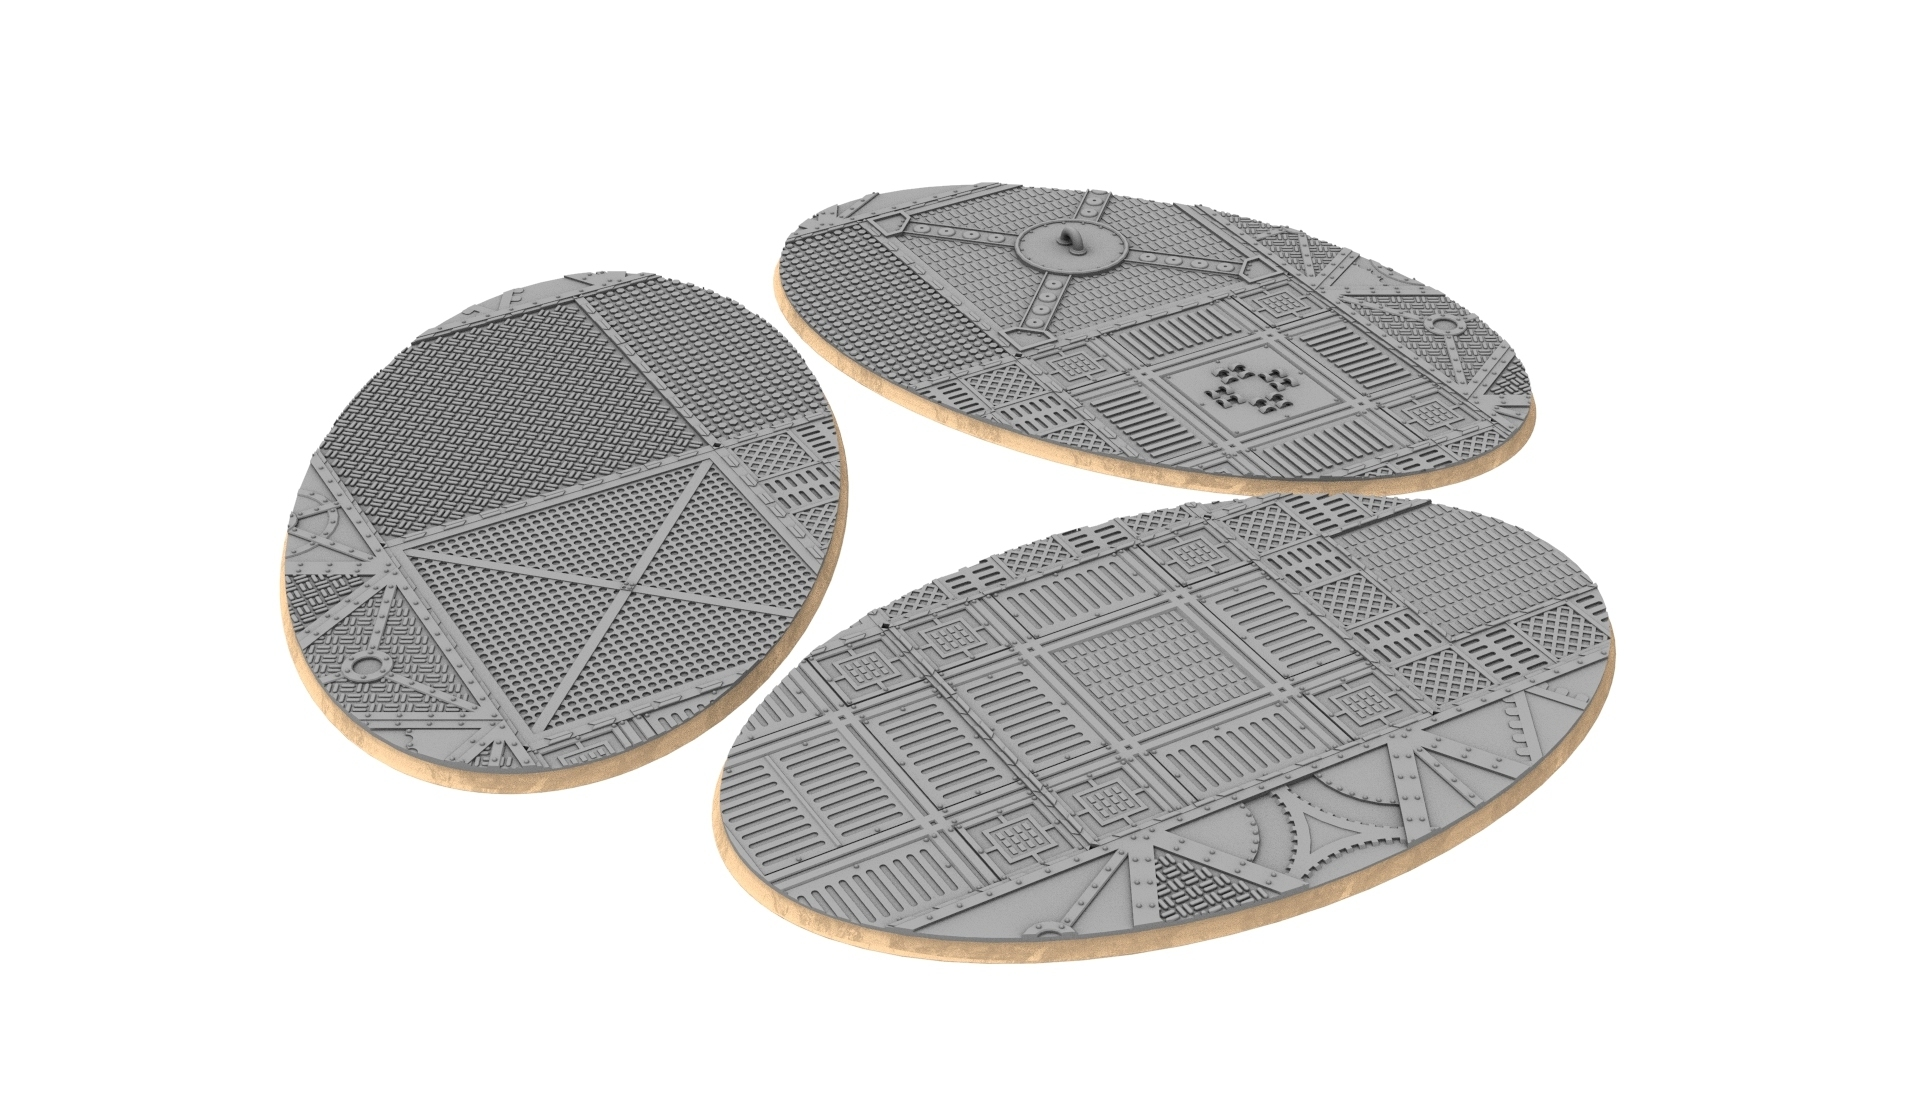 170x105.jpg Download STL file x1000 Round, oval, square, rectangular, hexagonal, industrial textured bases • 3D print design, Alario